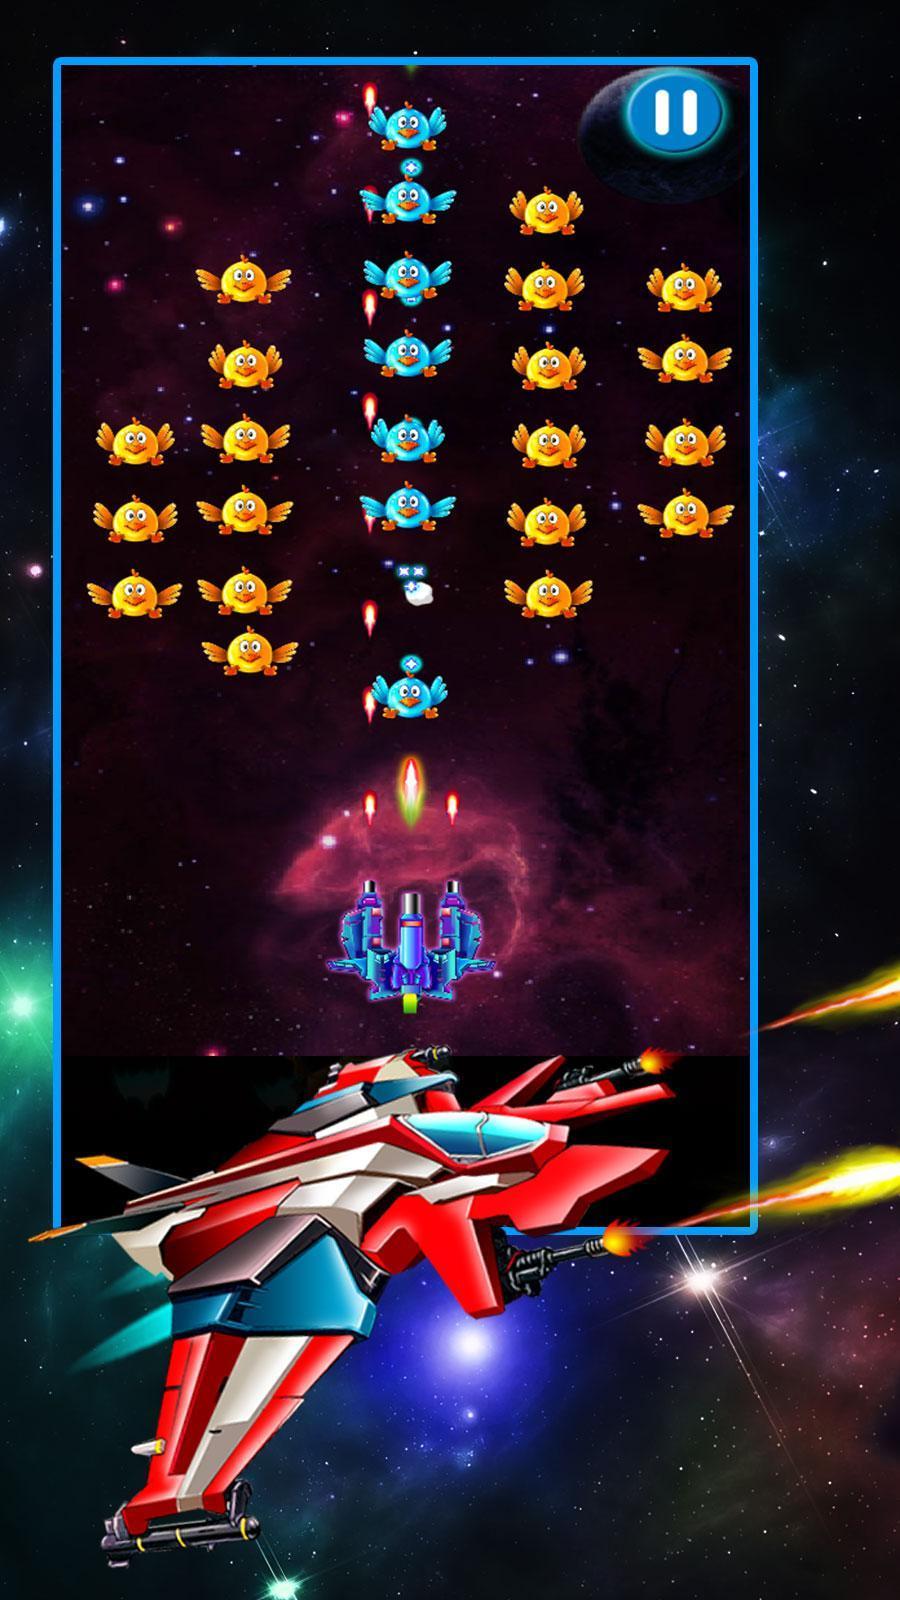 Chicken Shooter Galaxy Attack 2.8 Screenshot 13